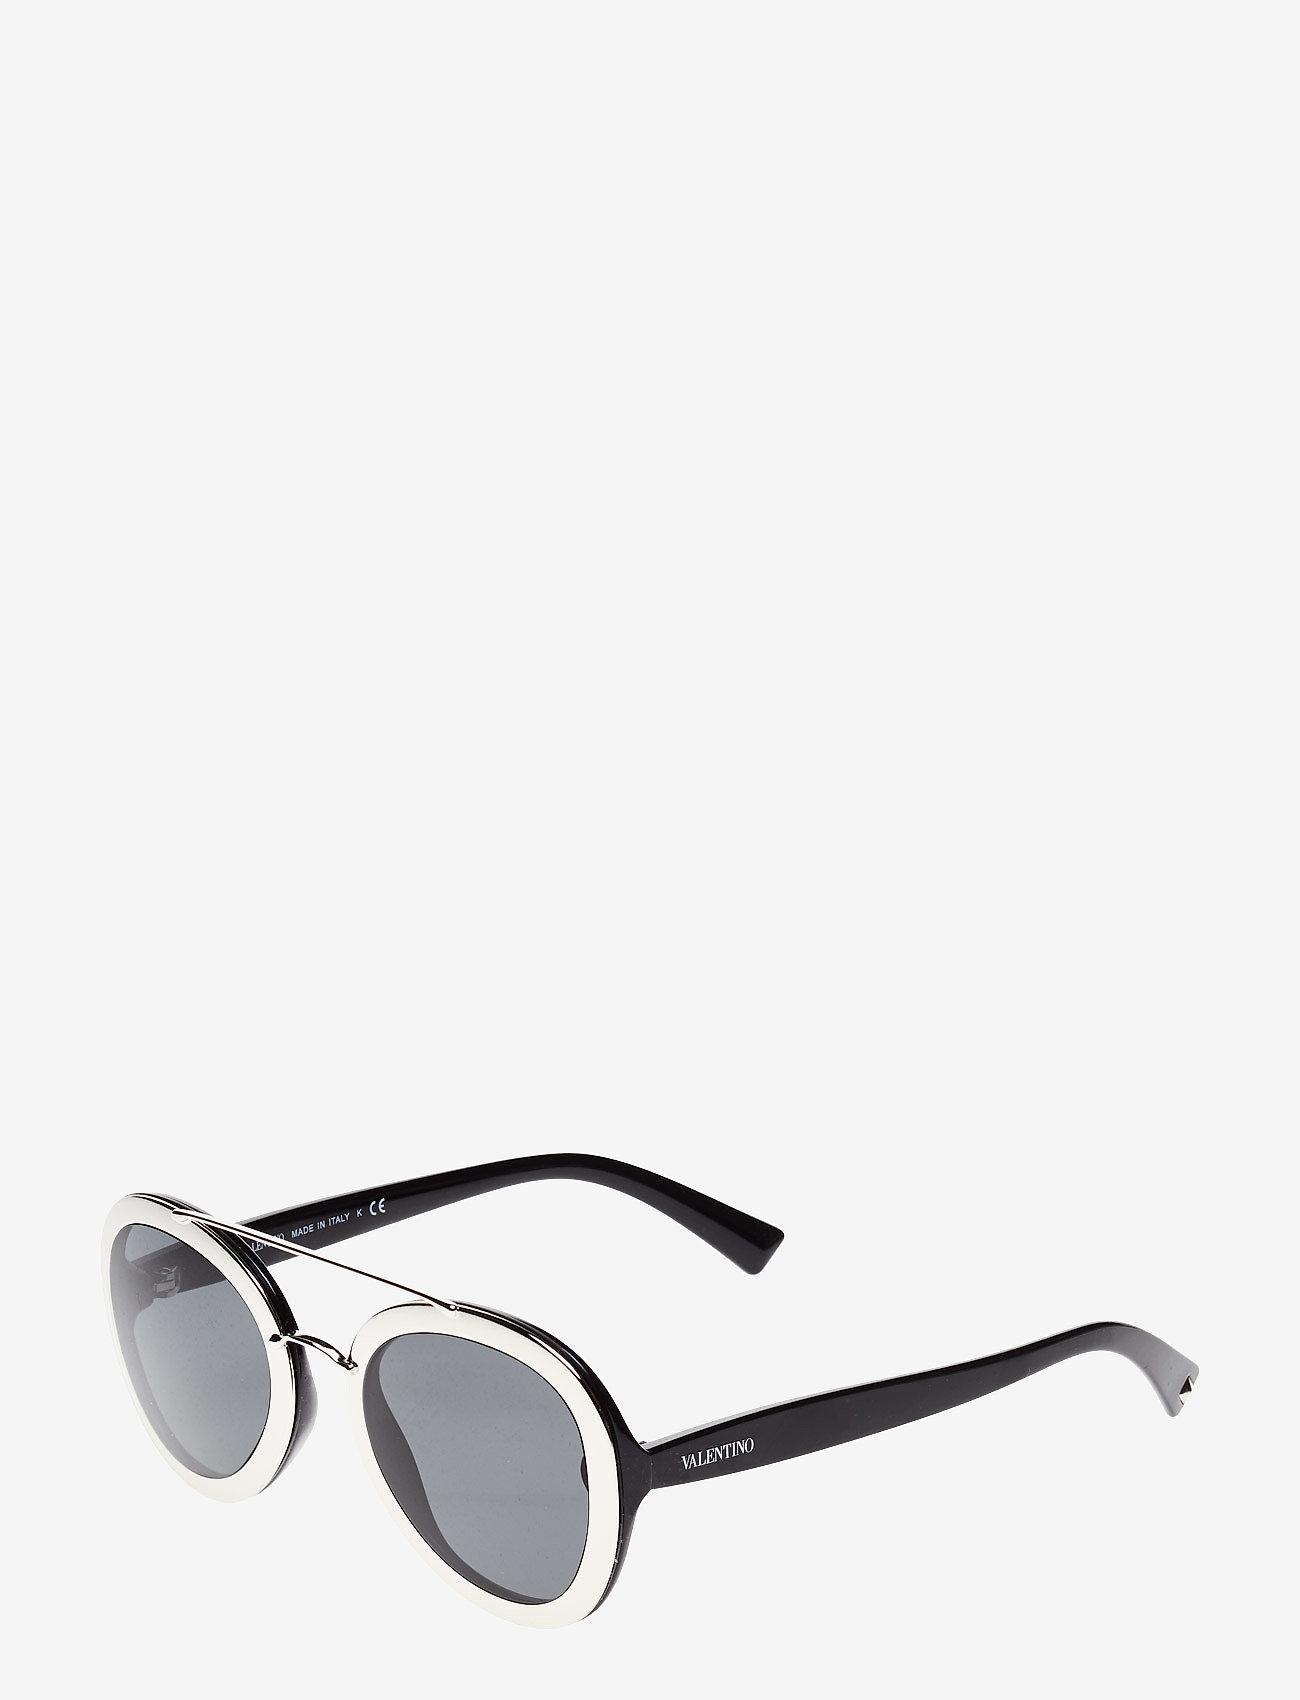 Valentino Sunglasses - ROCKER - round frame - silver - 1